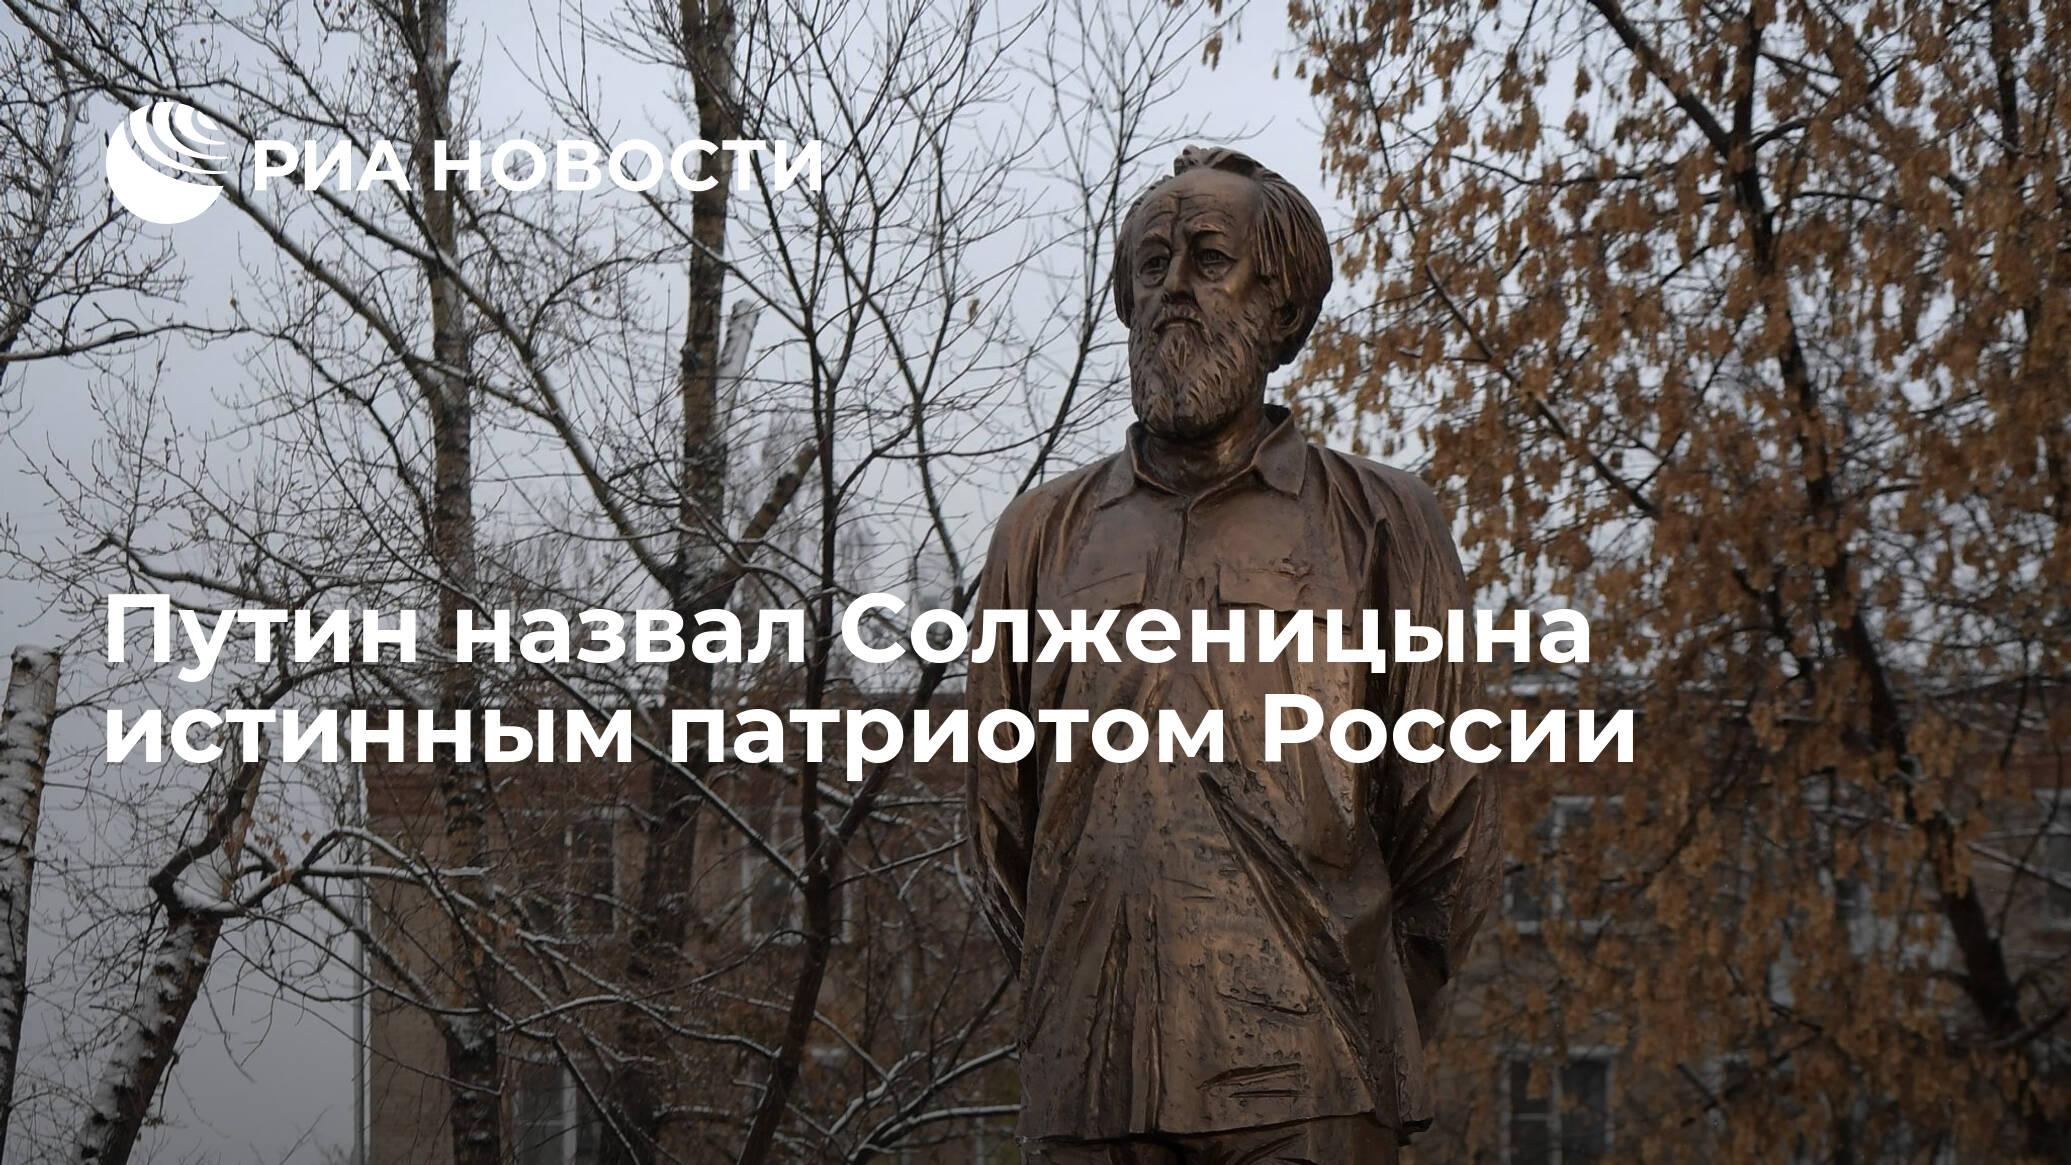 https://cdn21.img.ria.ru/images/sharing/article/1547797642.jpg?15477917271583230672